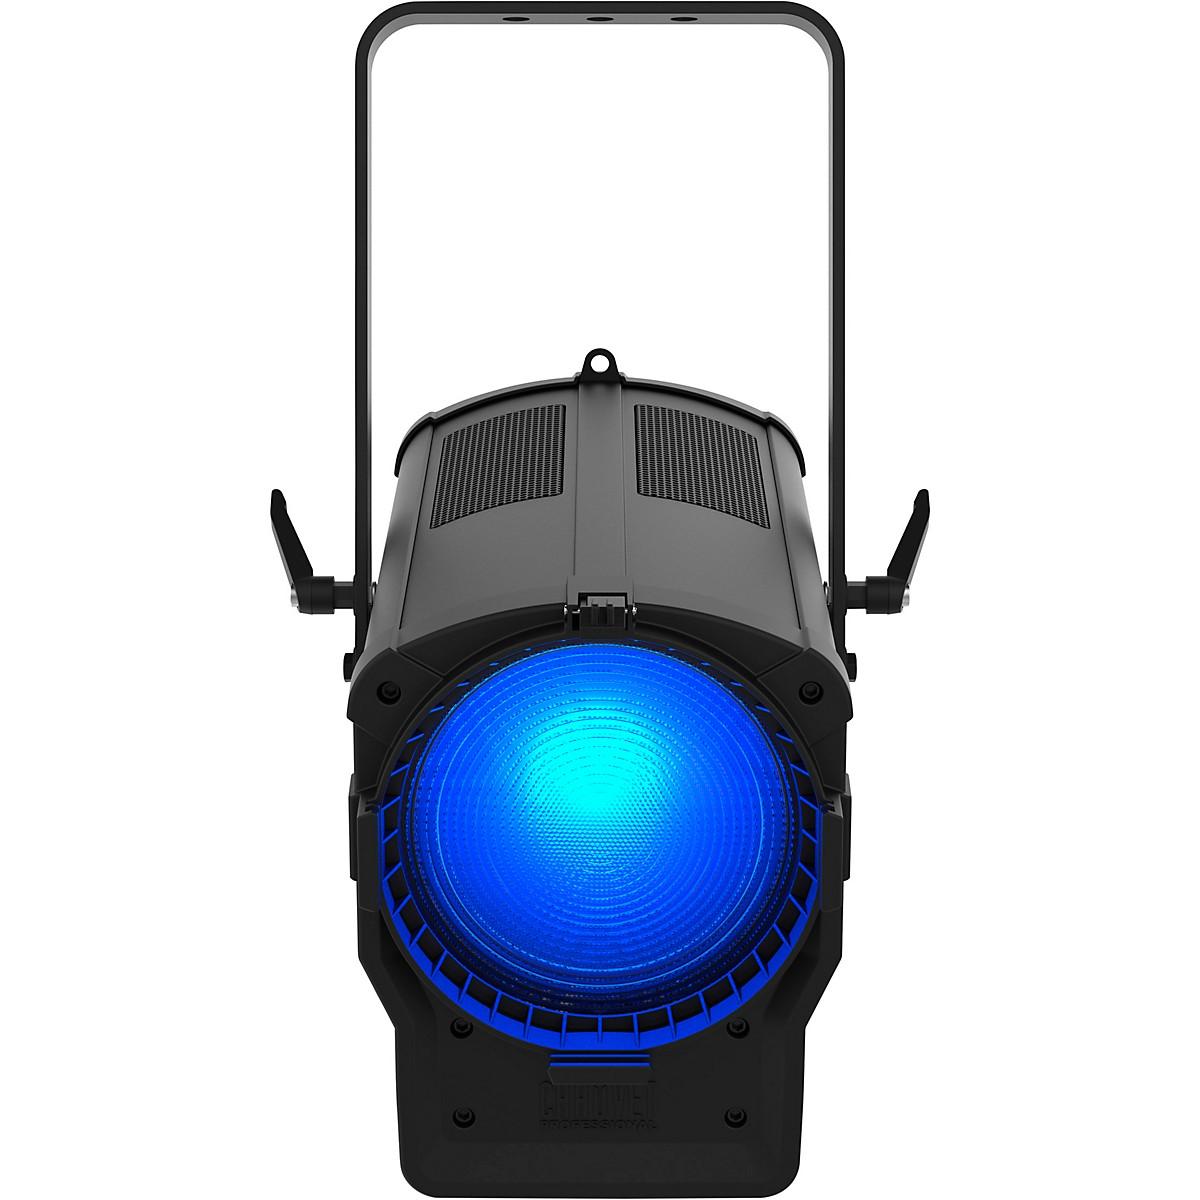 CHAUVET Professional Ovation F-915FC RGBAL LED Fresnel Wash Light